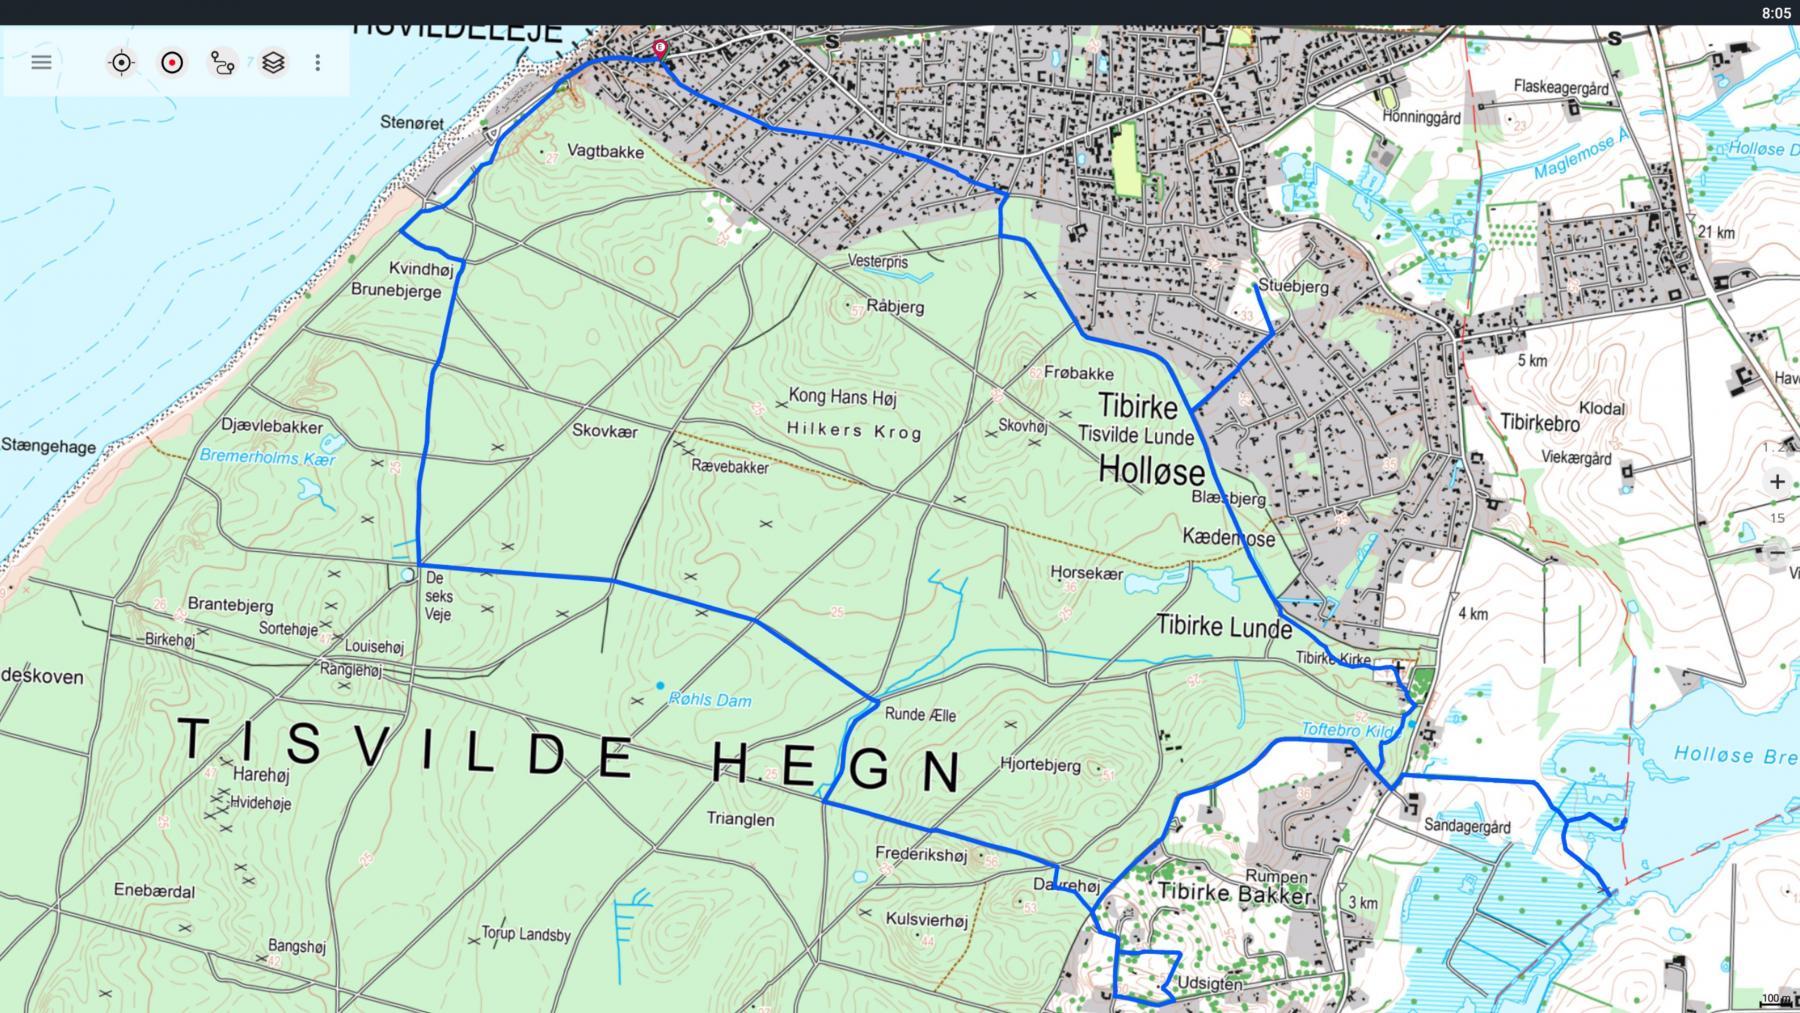 Denmark-Topo-Maps_Screenshot_2020.05.23_20.05.14